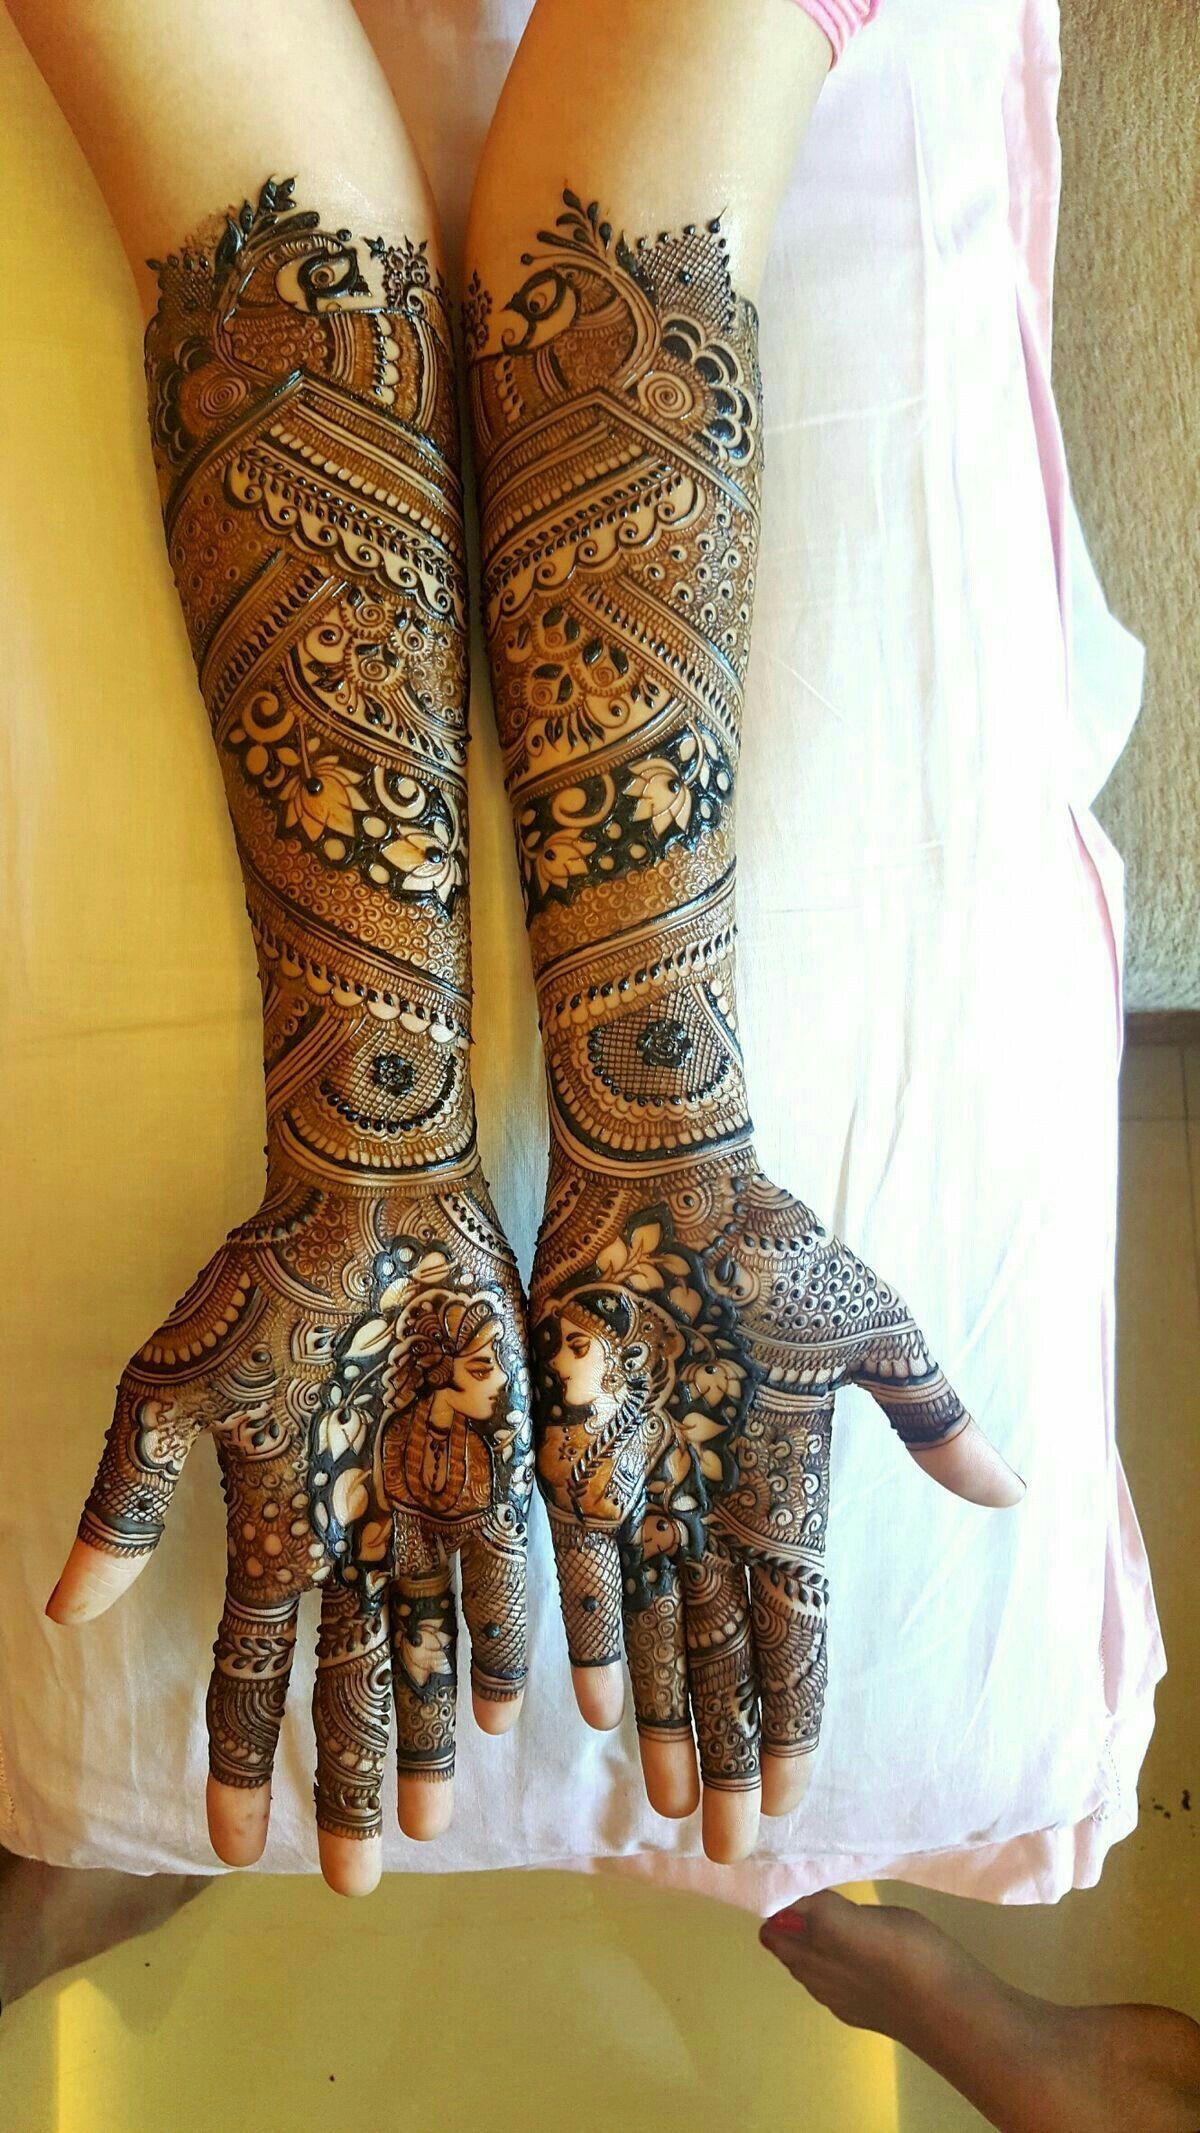 PunjabKesari, New Mehndi Design For Full Hands, न्यू मेहंदी डिजाइन फॉर फुलहैंड